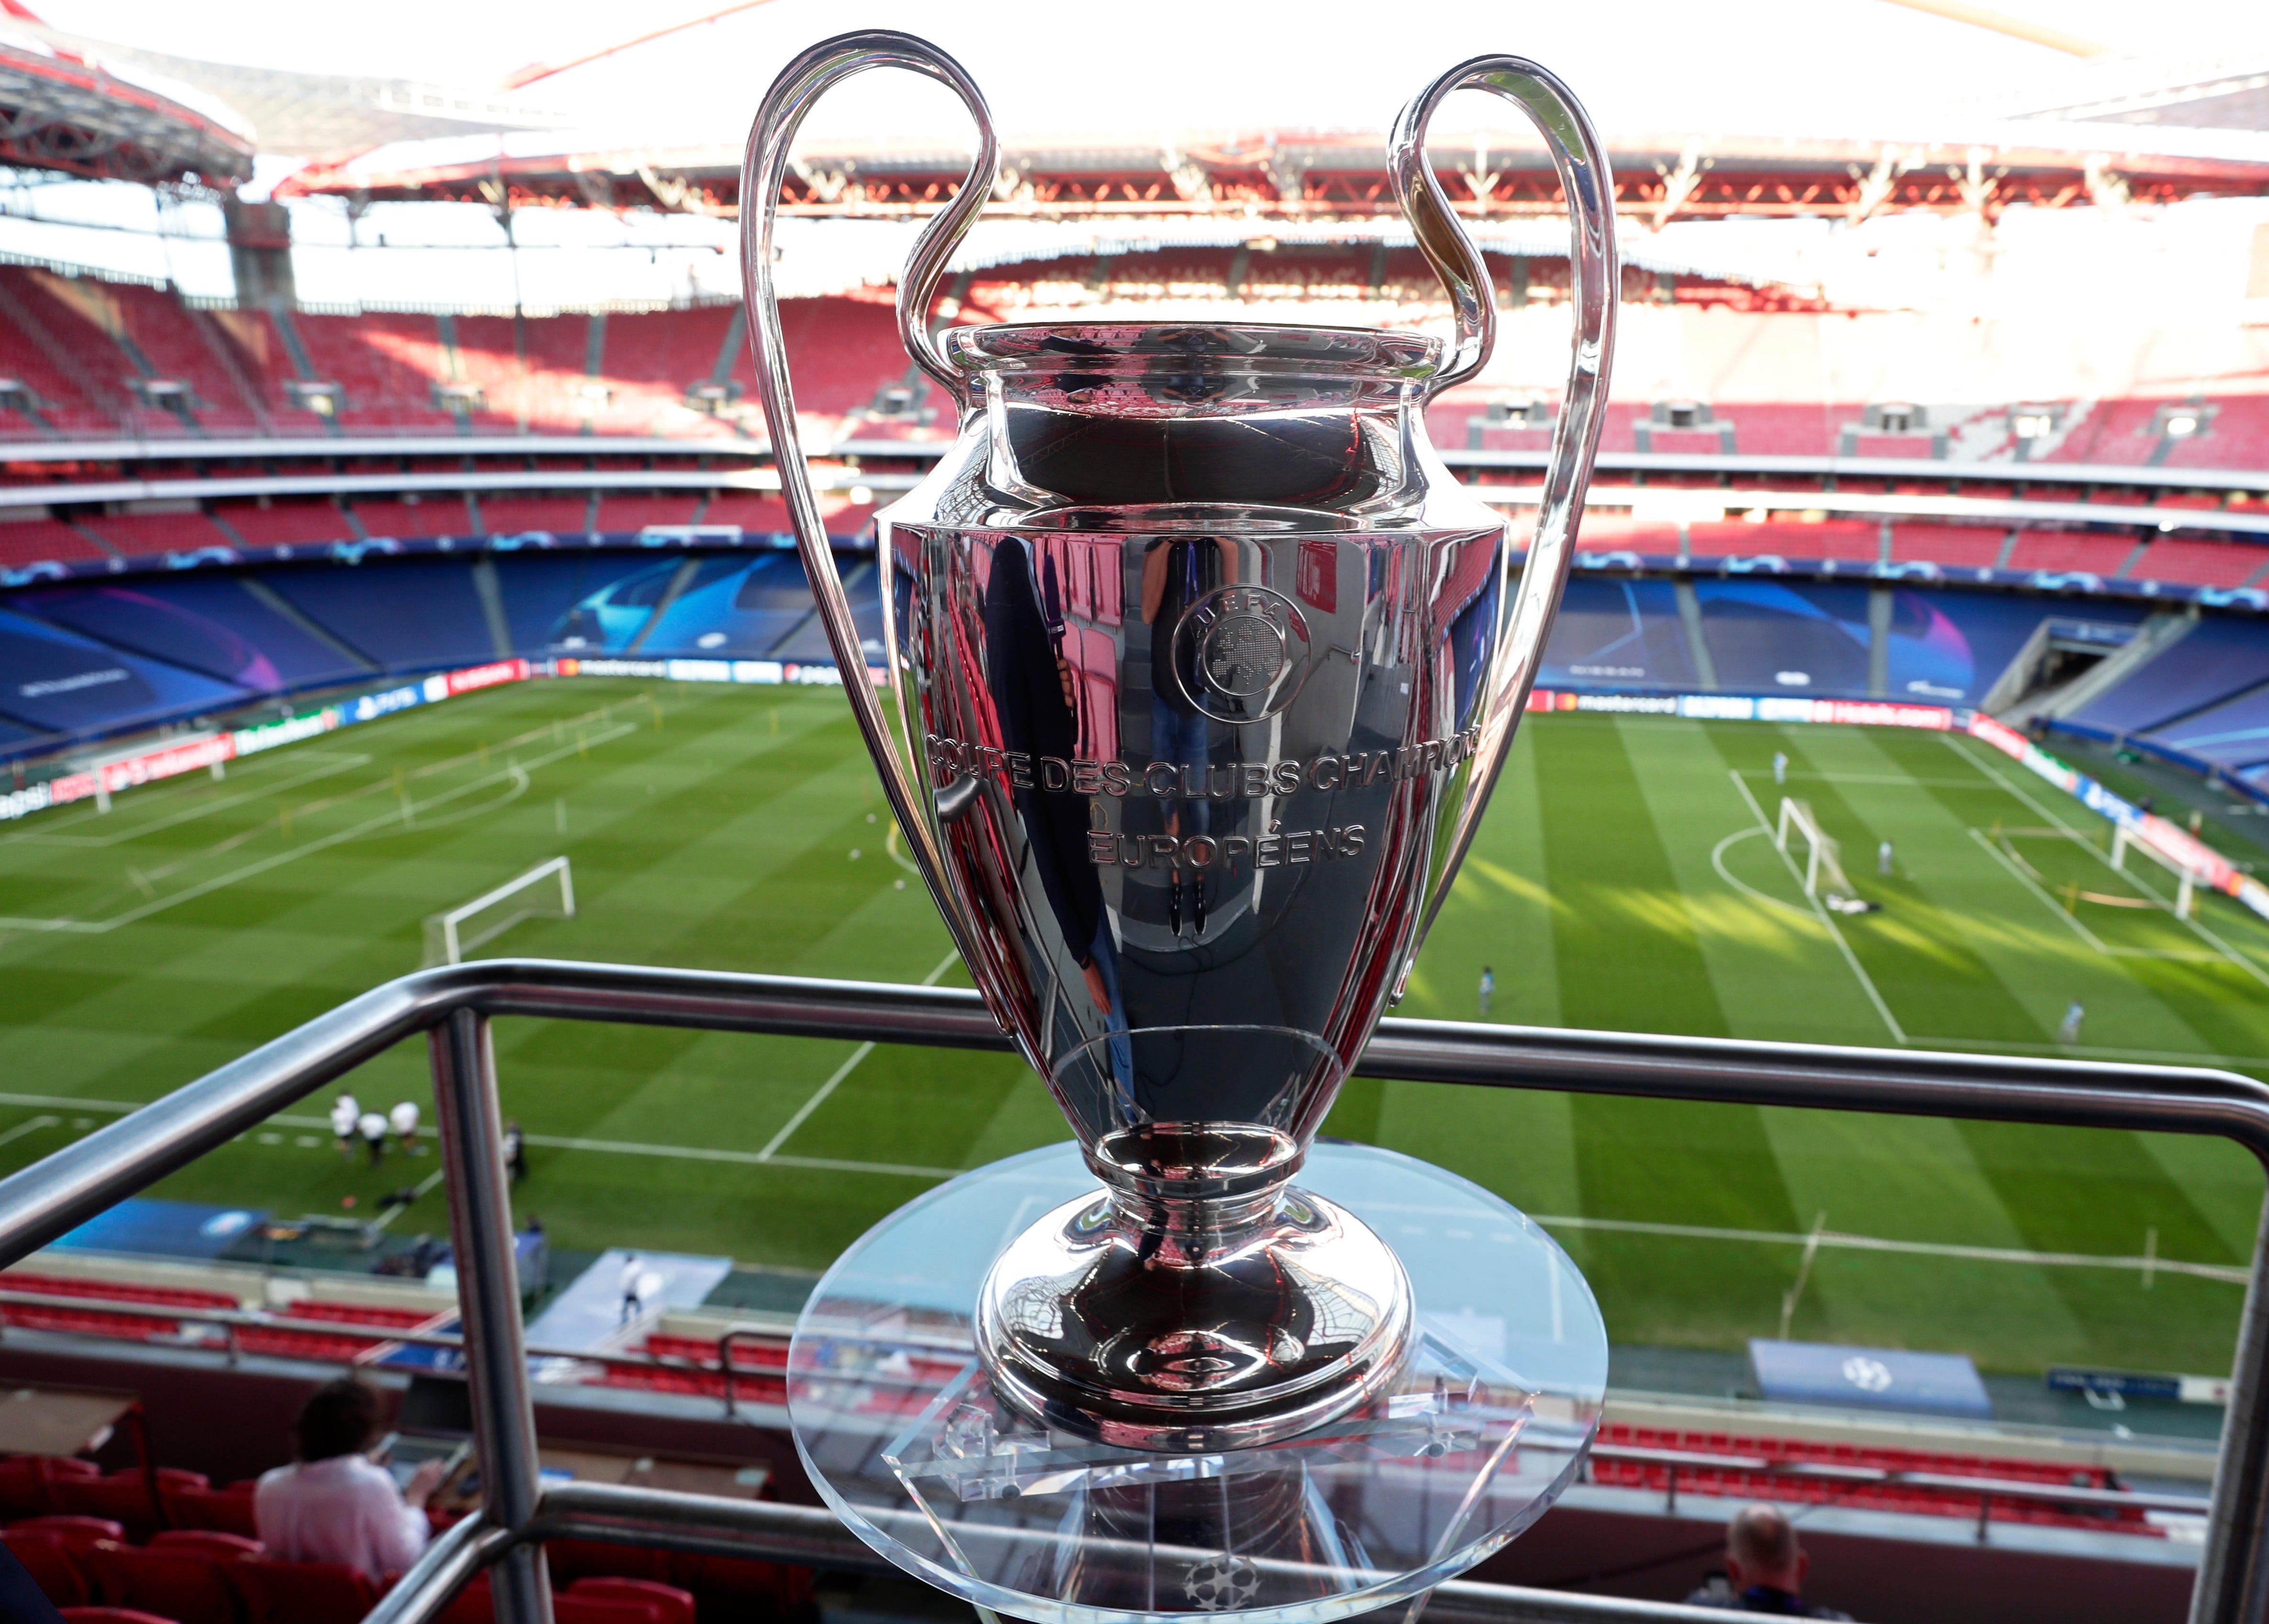 uefa champions league final bayern munich psg tv and streaming info usa today